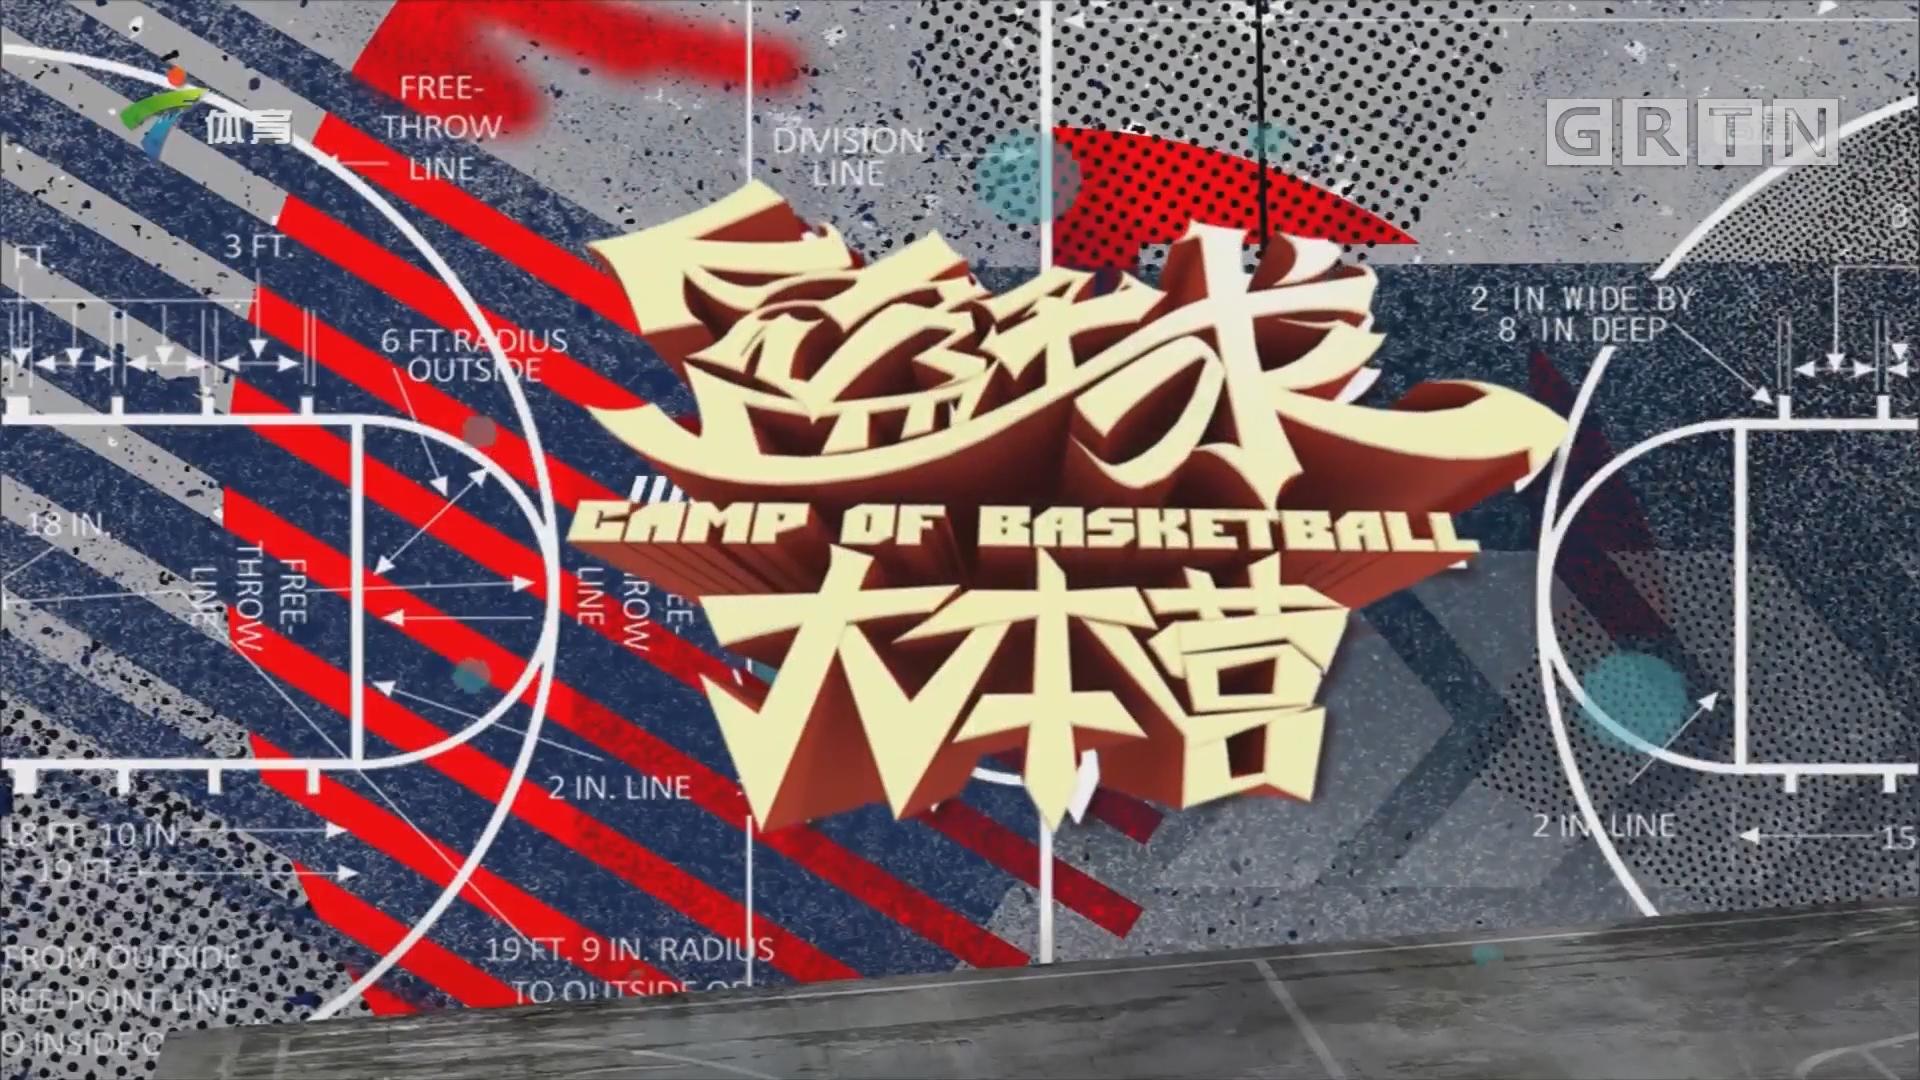 [HD][2018-05-31]篮球大本营:东部总结:年轻绿军难挡老詹继续前行